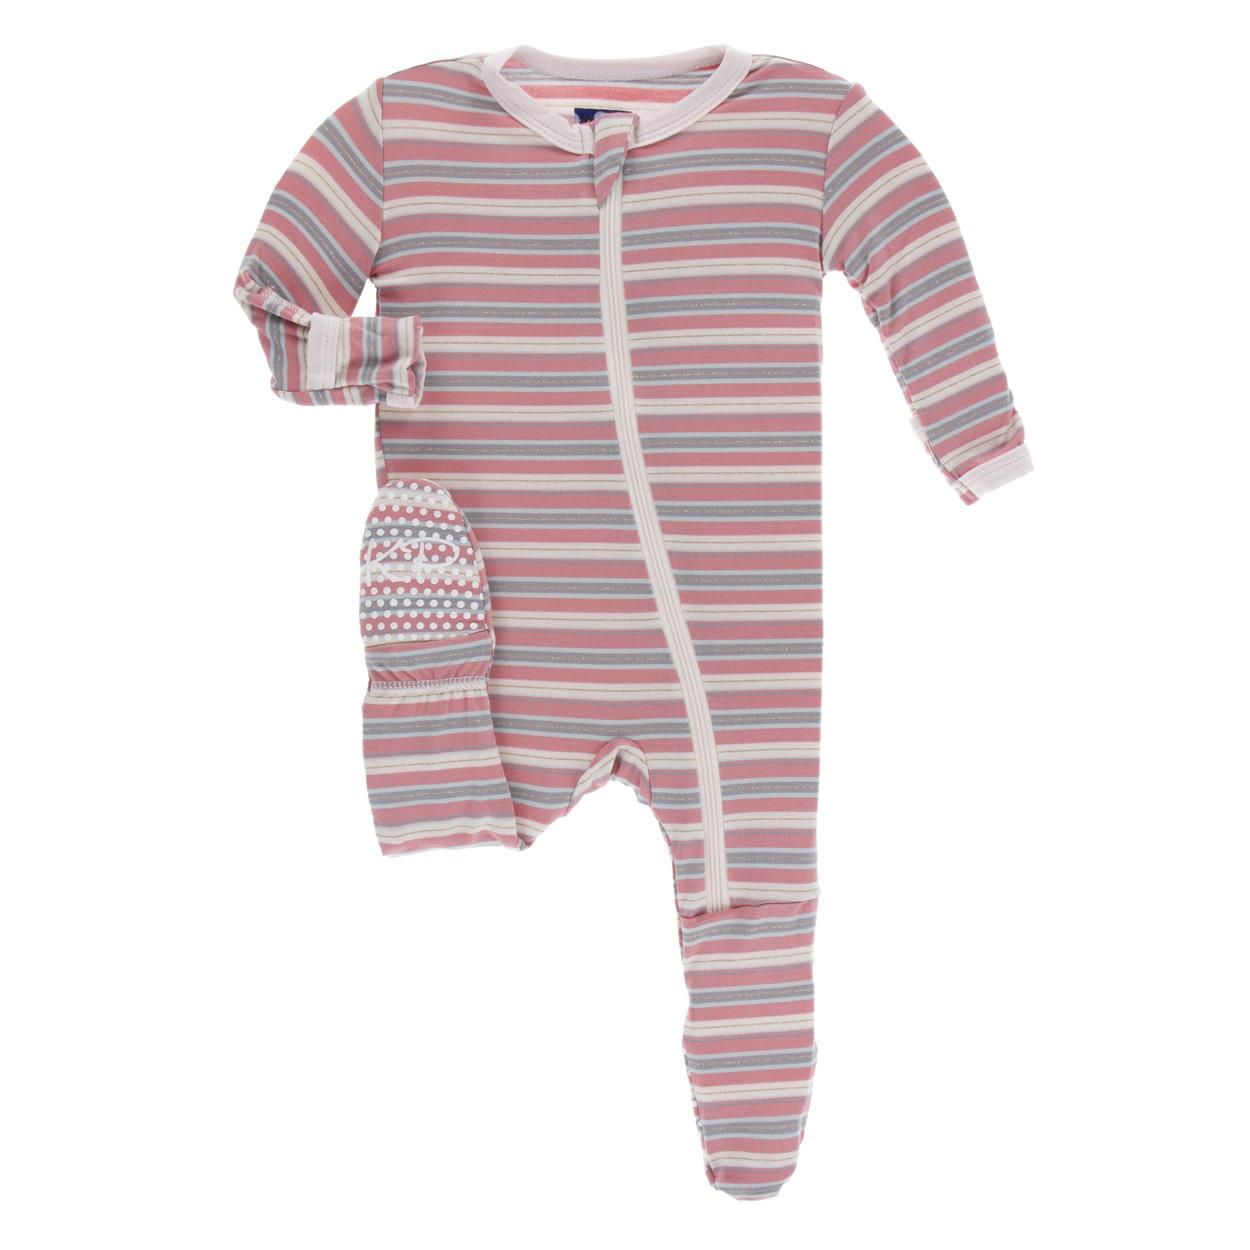 Kickee Pants Print Footie with Zipper India Dawn Stripe